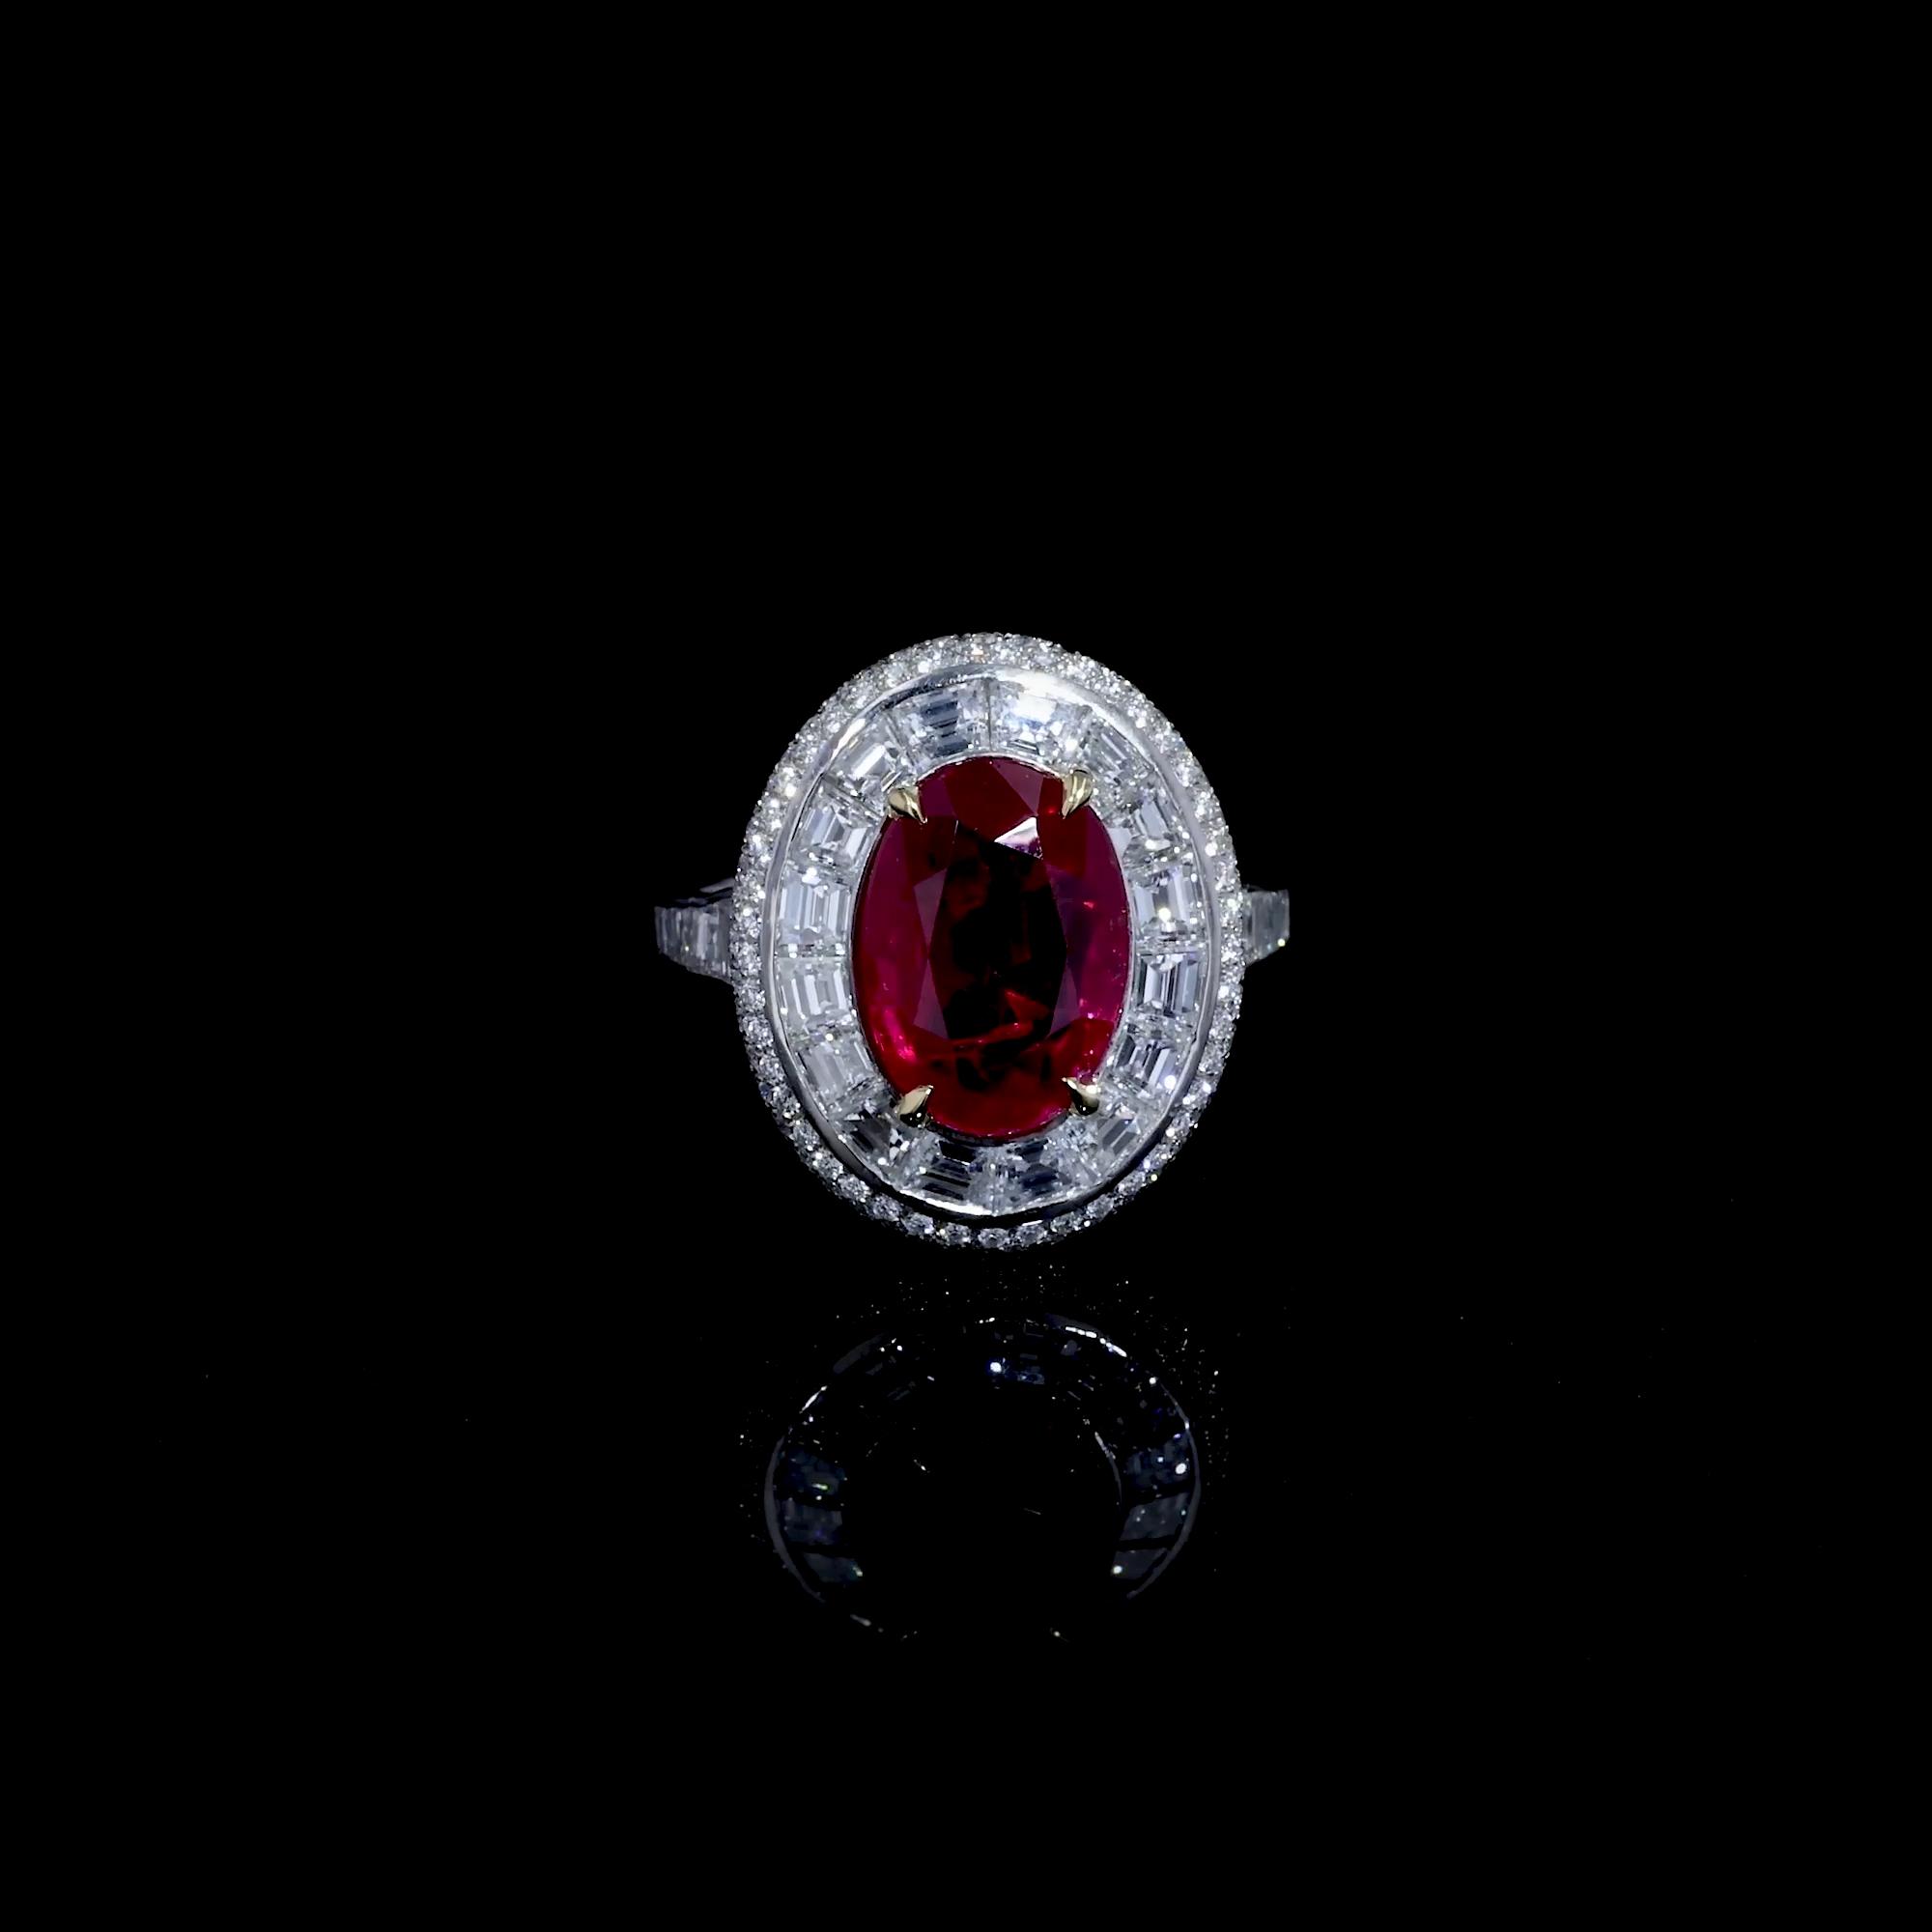 5611058_v501 Unheated with a Diamond Surround_501